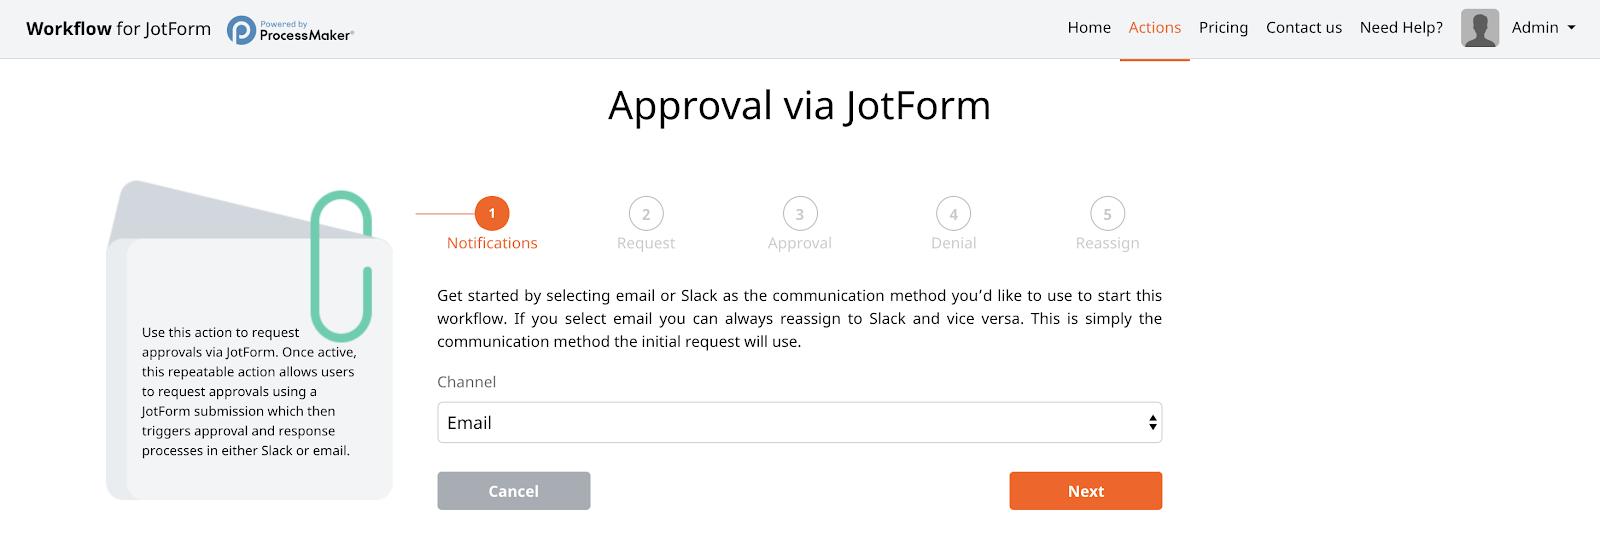 Communication Channel Selection JotForm ProcessMaker